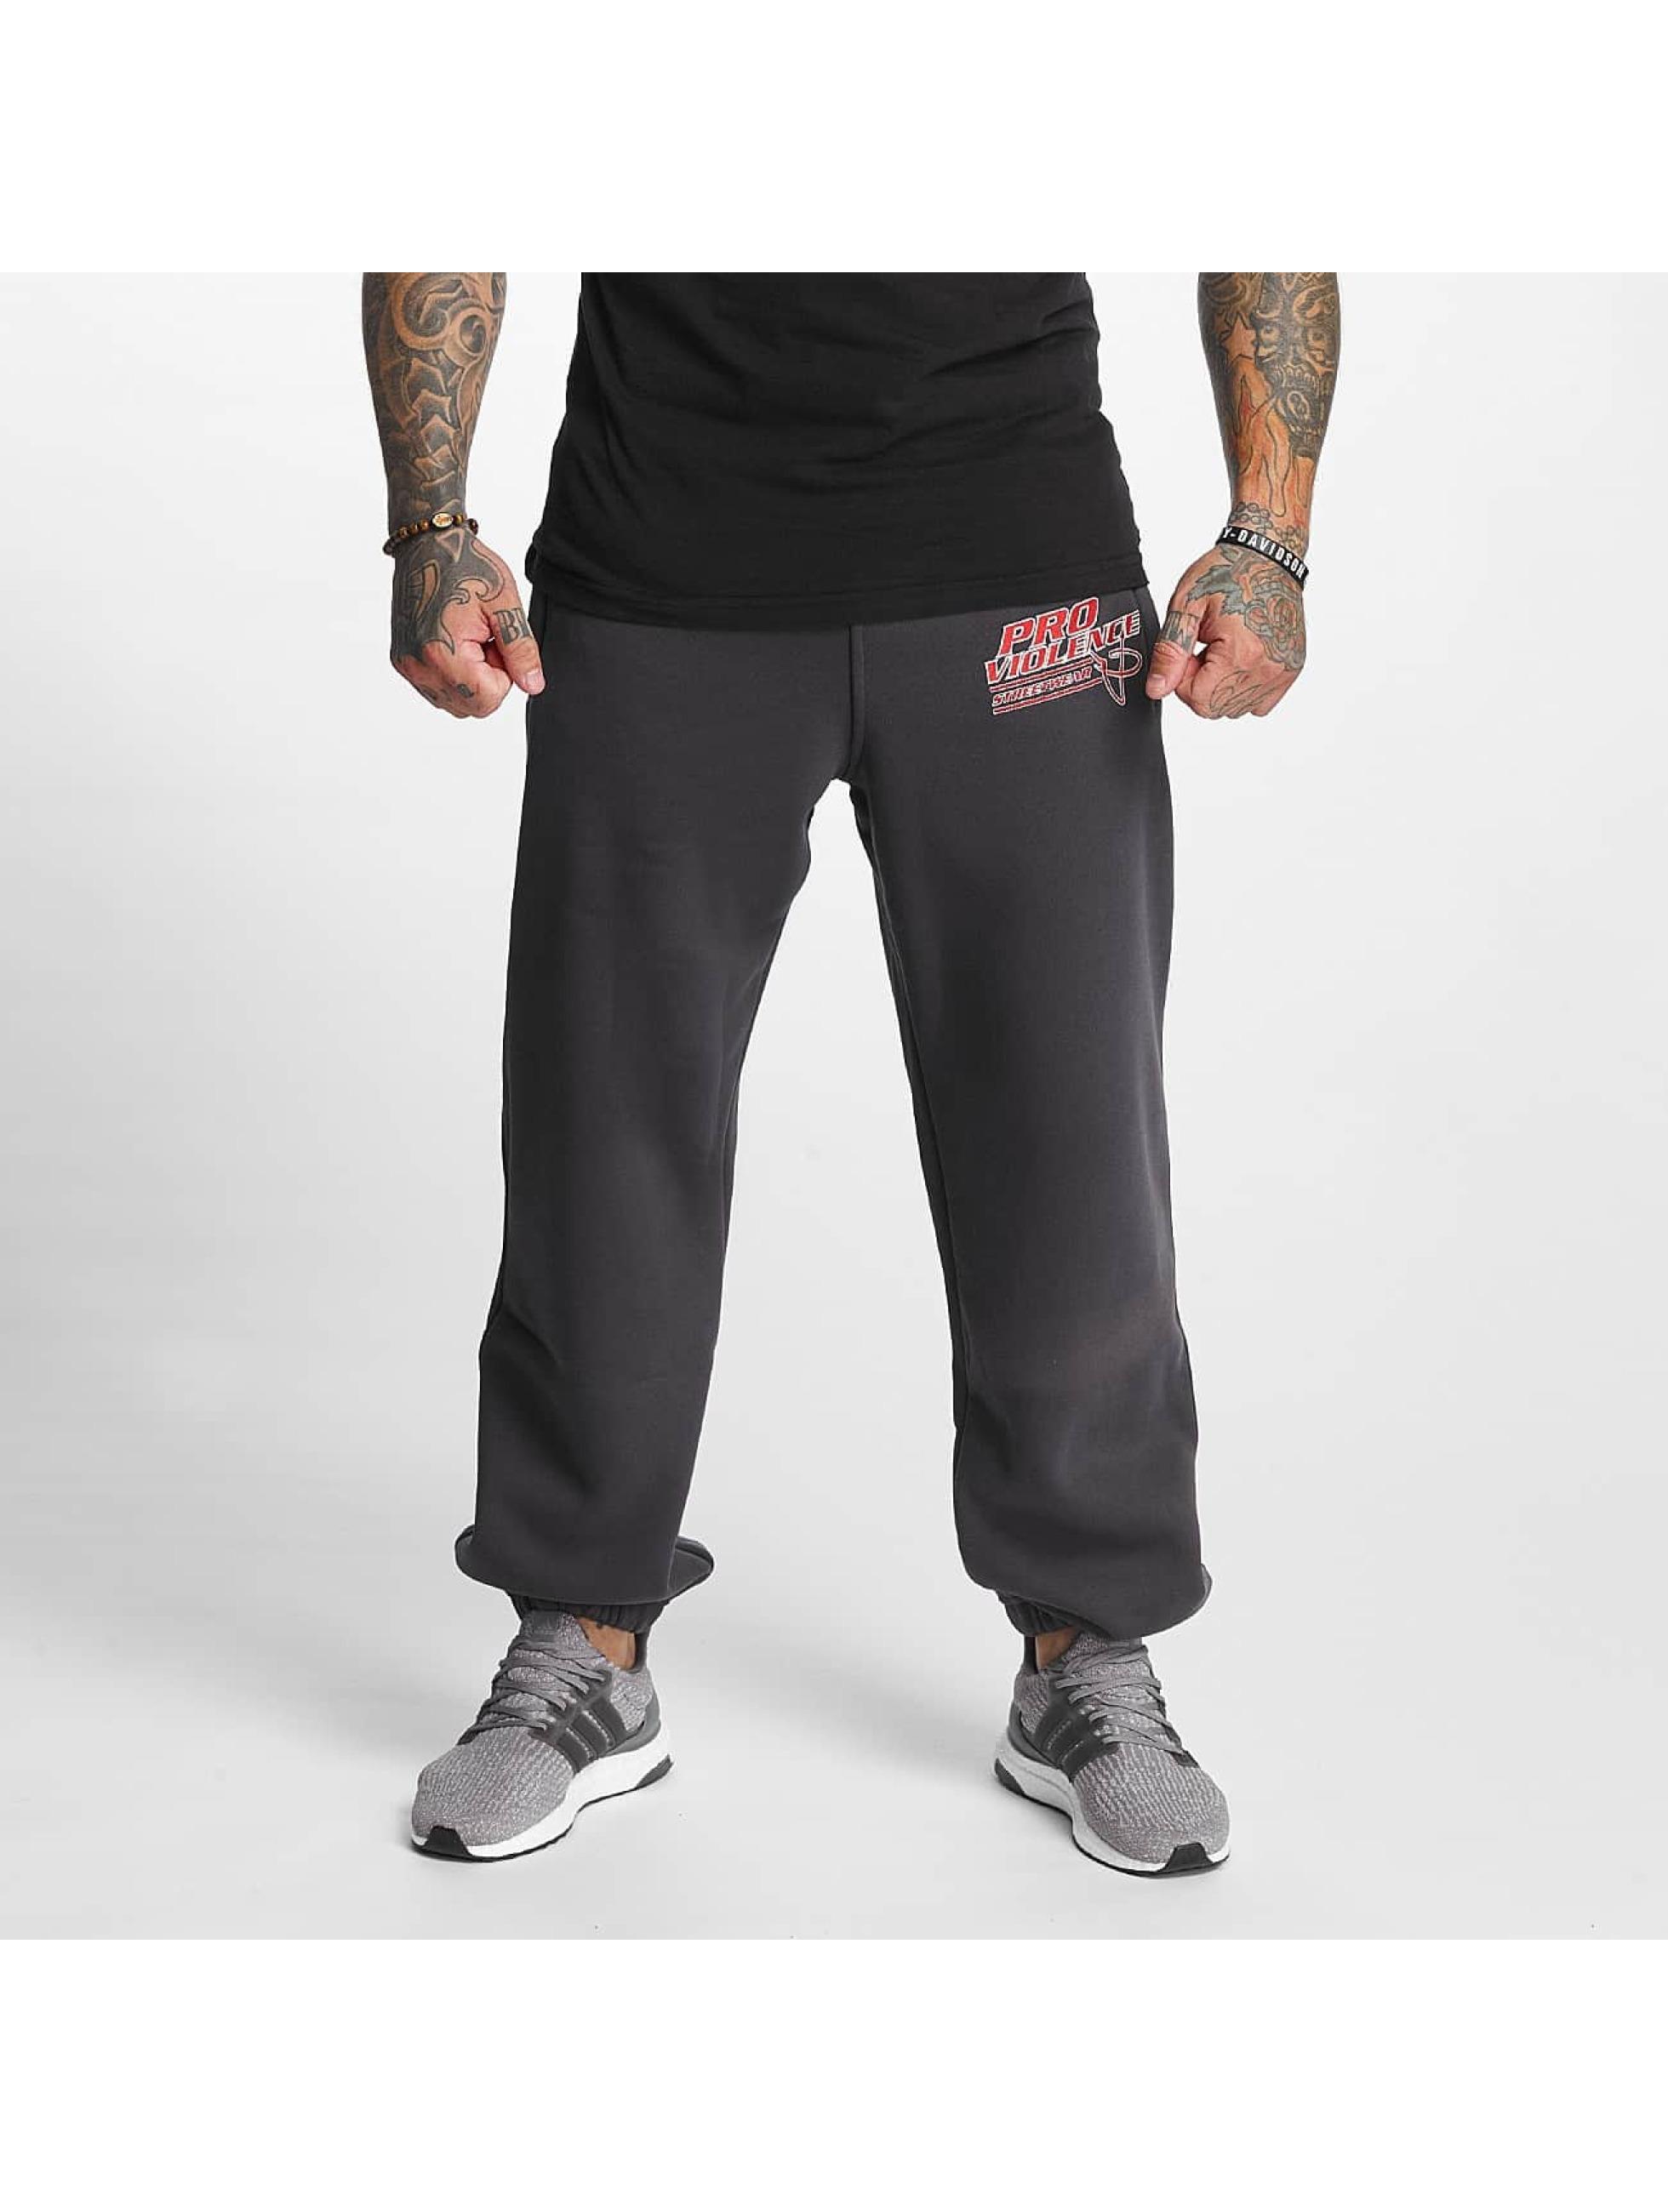 Pro Violence Streetwear Sweat Pant Label No. 1 gray